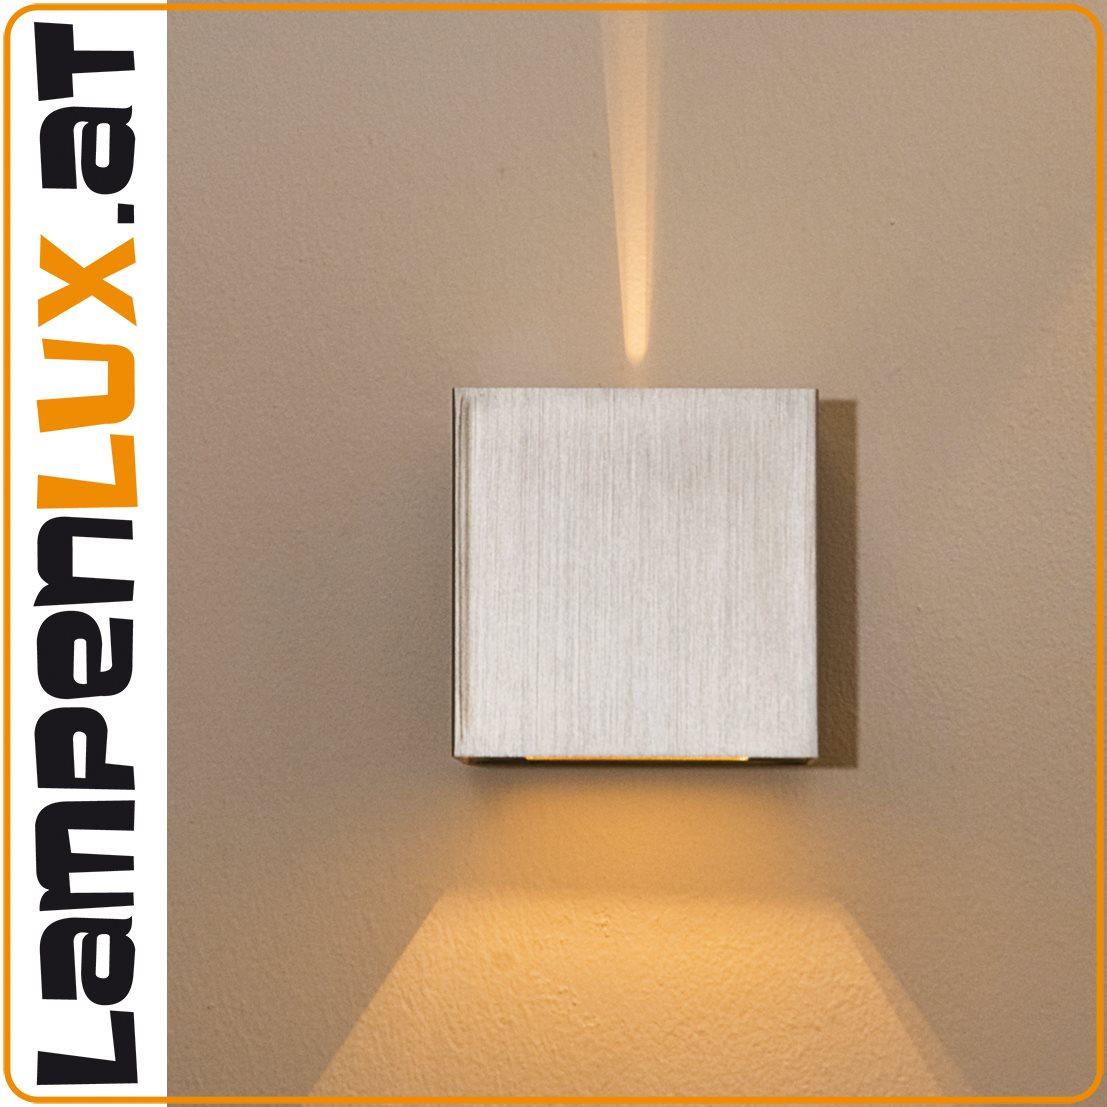 led wandlampe amon wandleuchte effektlampe eckig up down nickel aluminium ebay. Black Bedroom Furniture Sets. Home Design Ideas